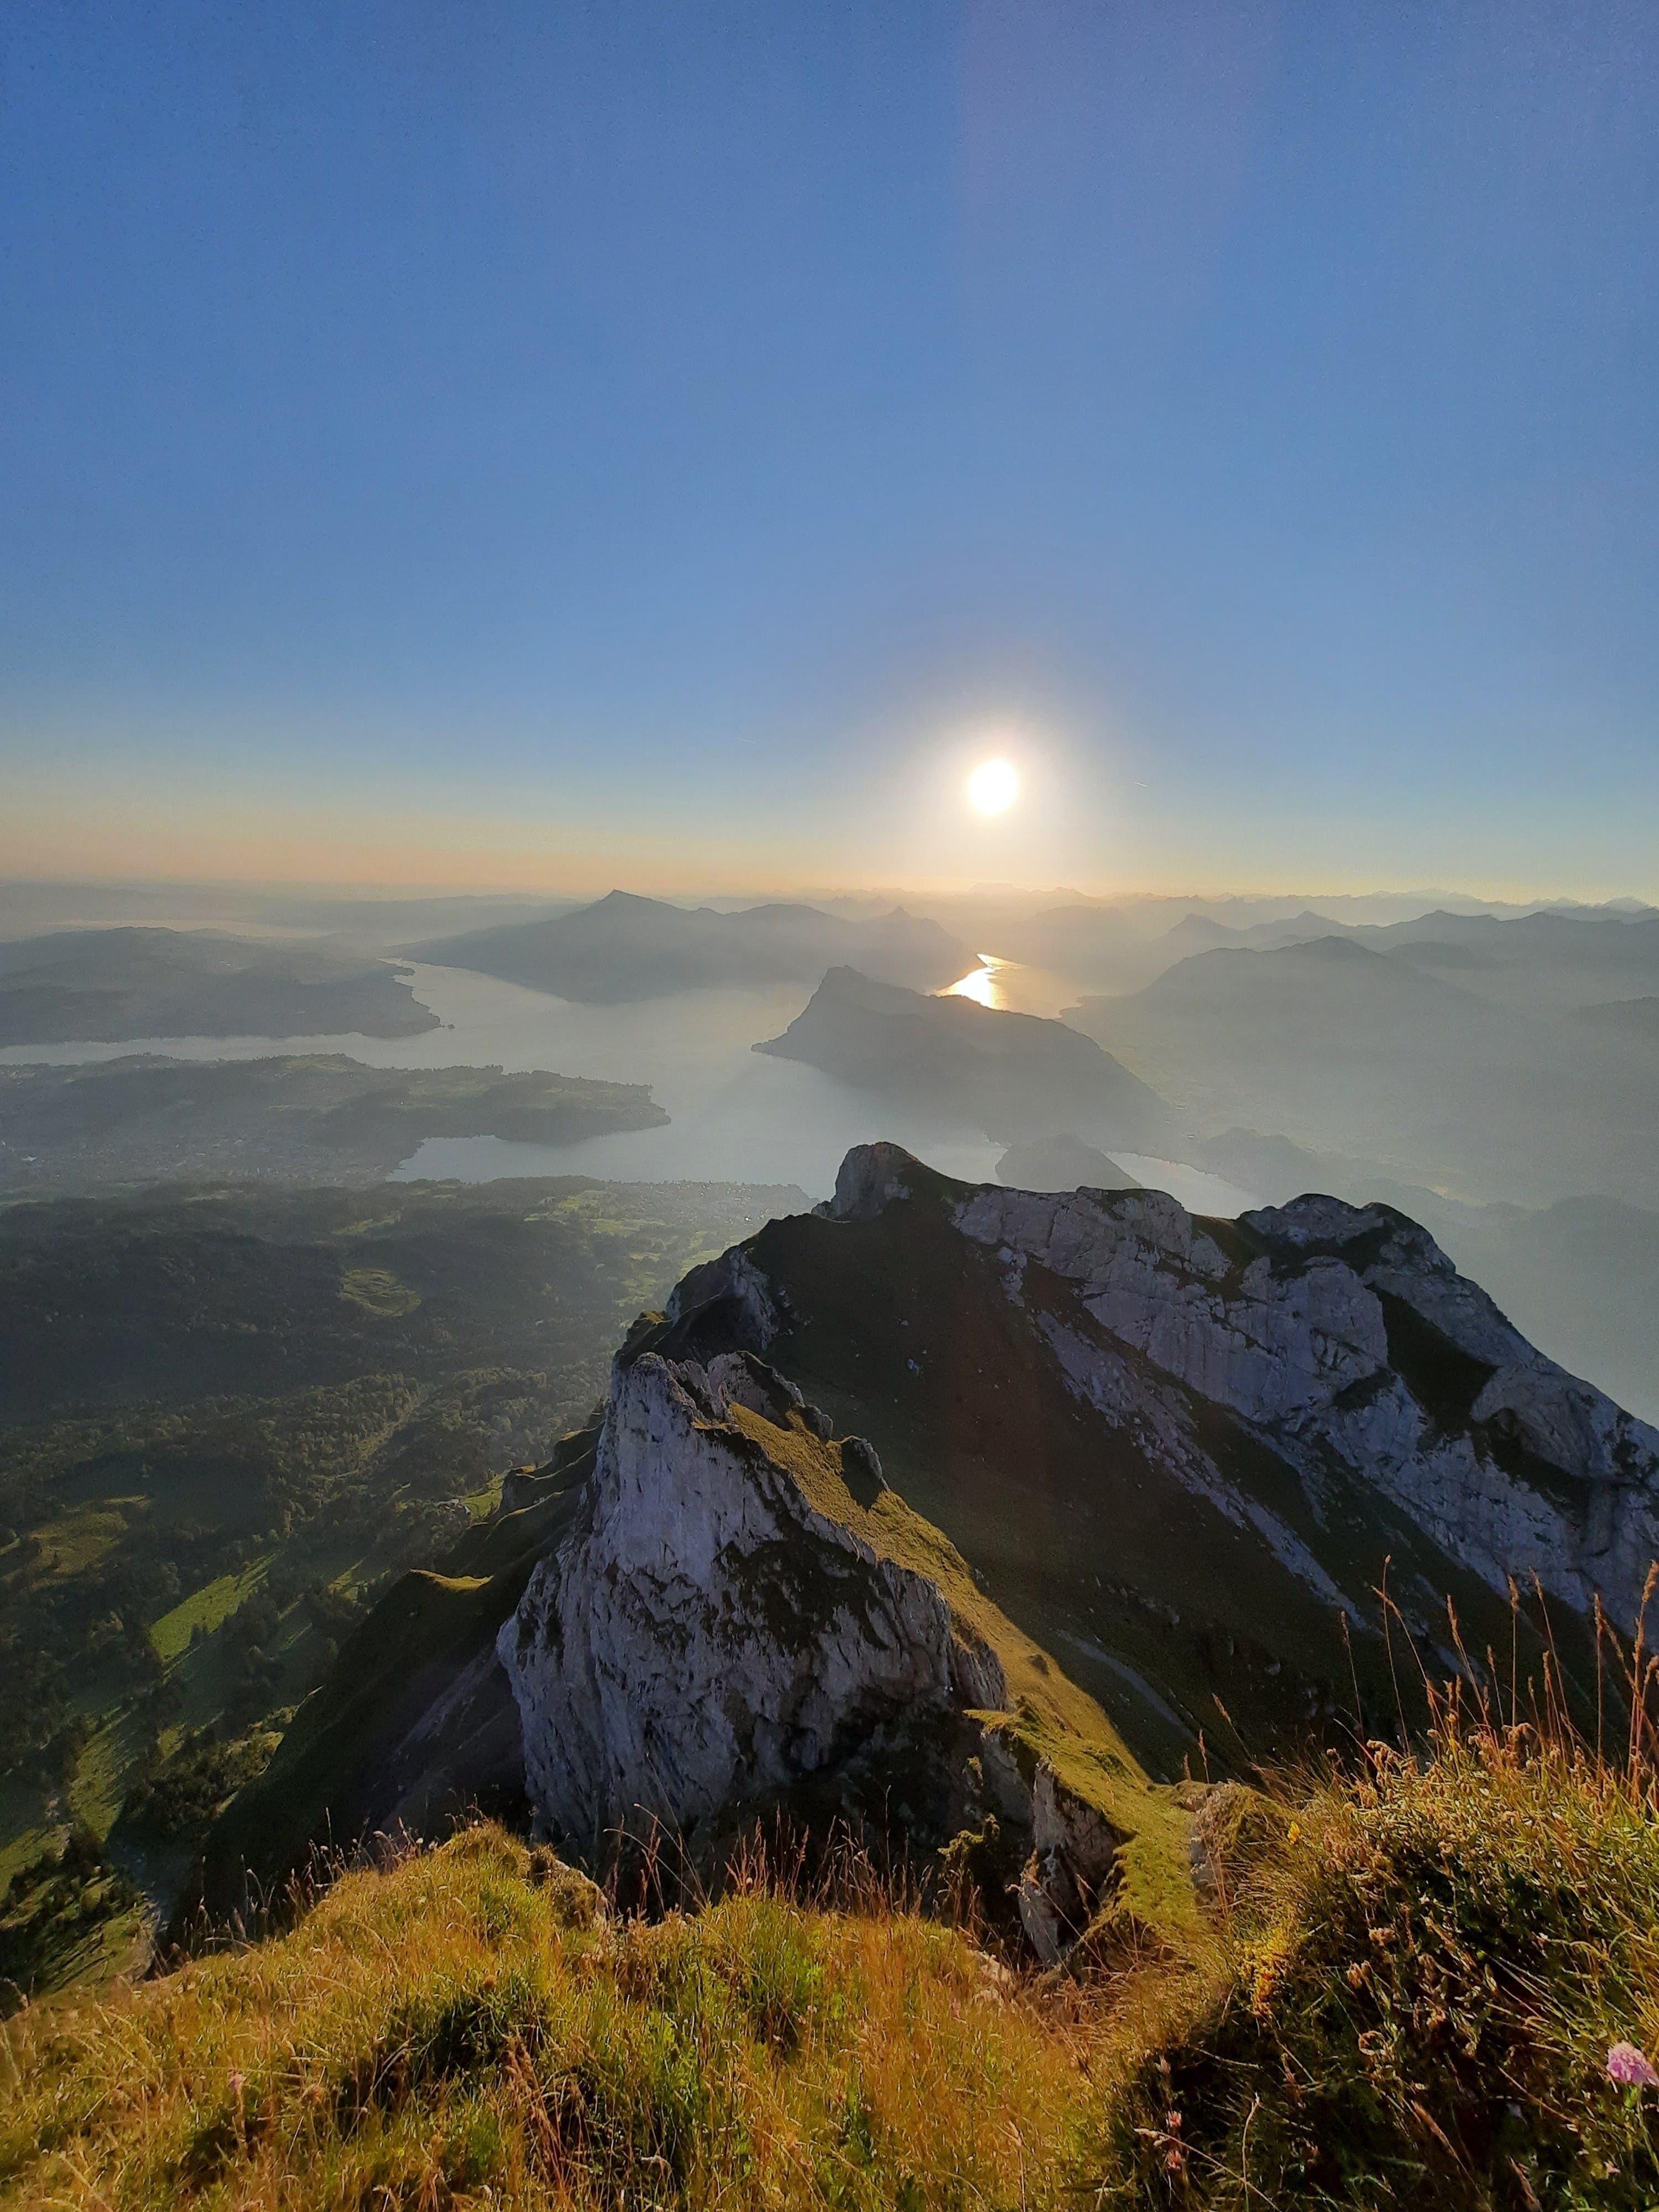 Sonnenaufgang auf dem Pilatus.